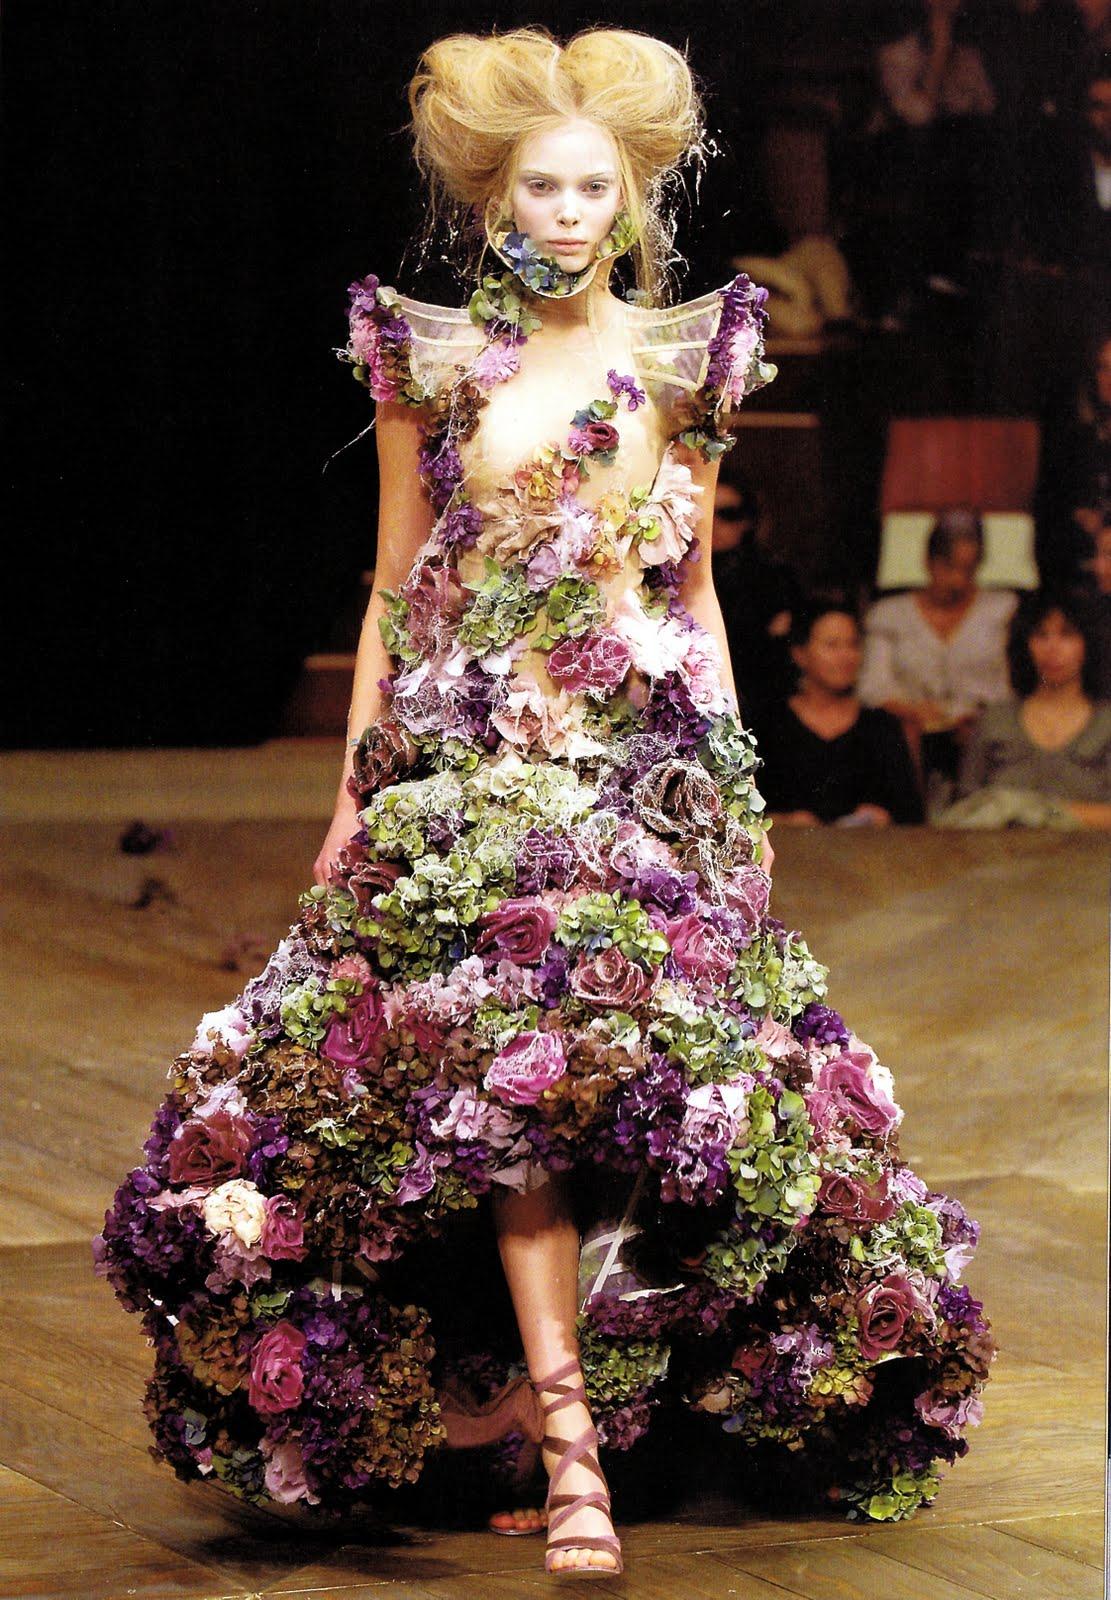 something fashion blogger, spain valencia, spring inspiration post, floral, alexander mcqueen flower dress 2007, interior design, tulips, seasonal inspo